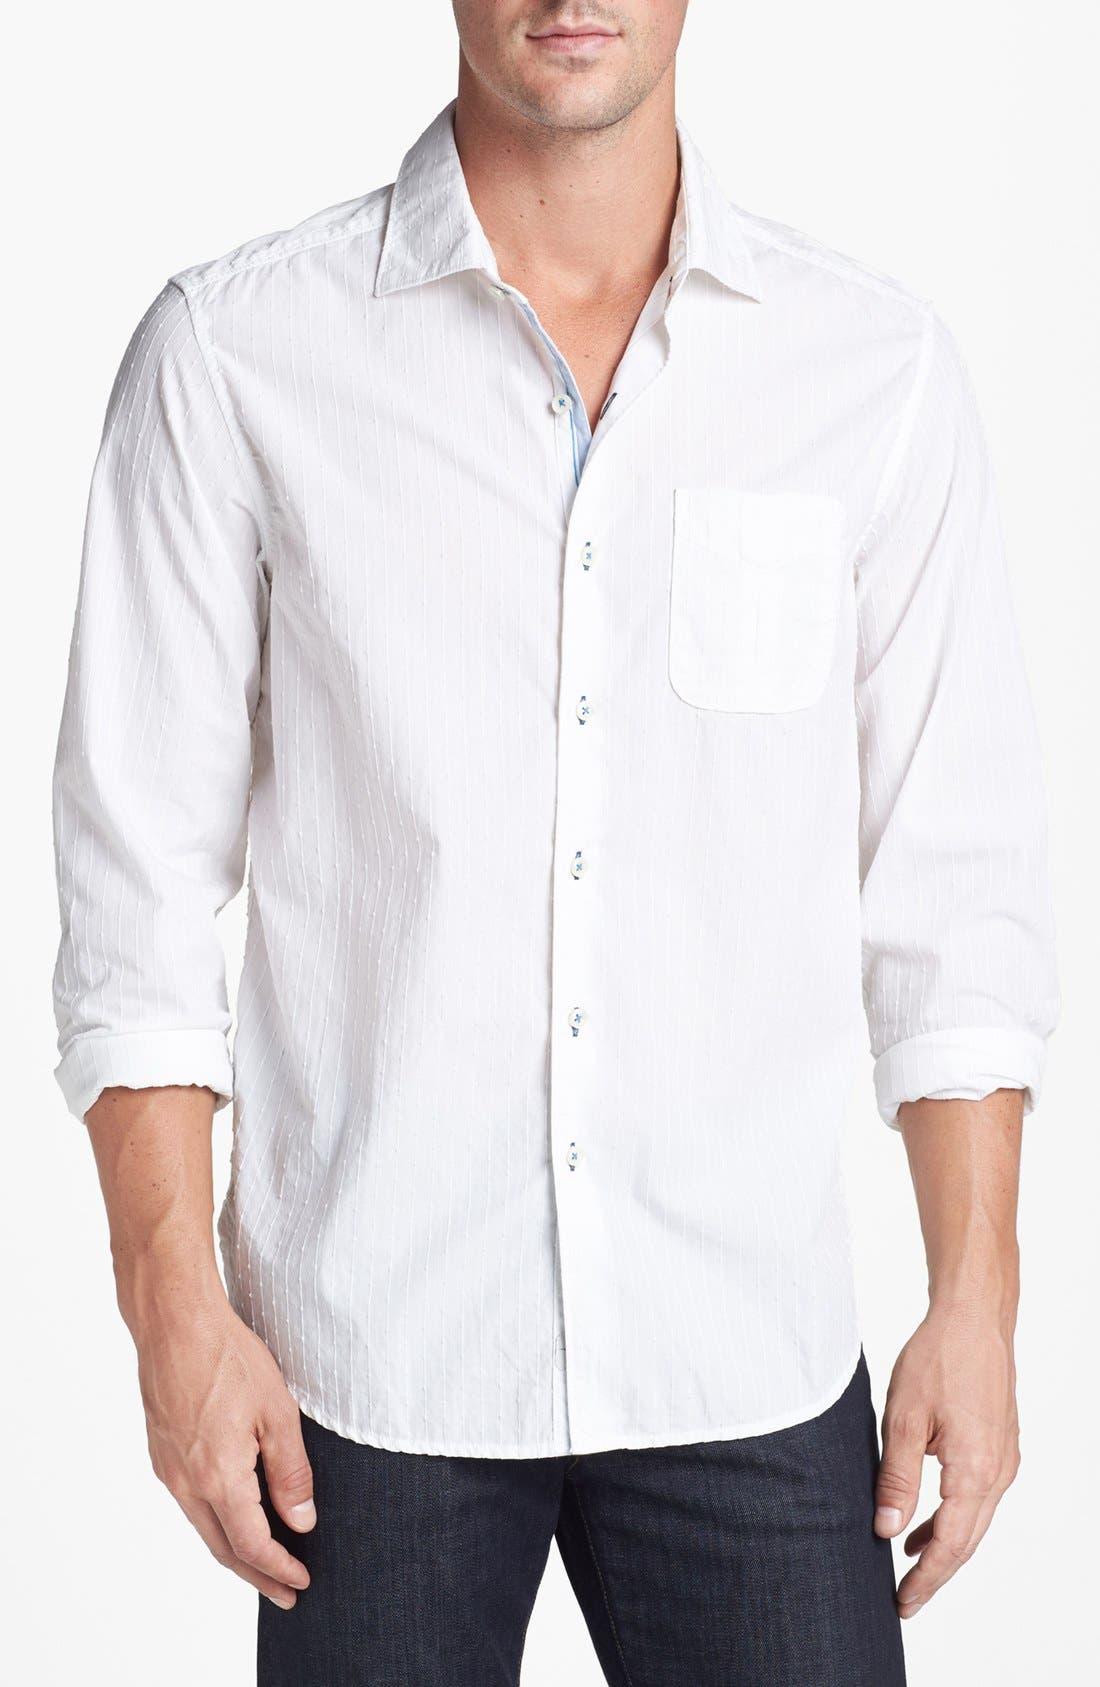 Main Image - Tommy Bahama Denim '3 Stripe 'n Seek' Island Modern Fit Sport Shirt